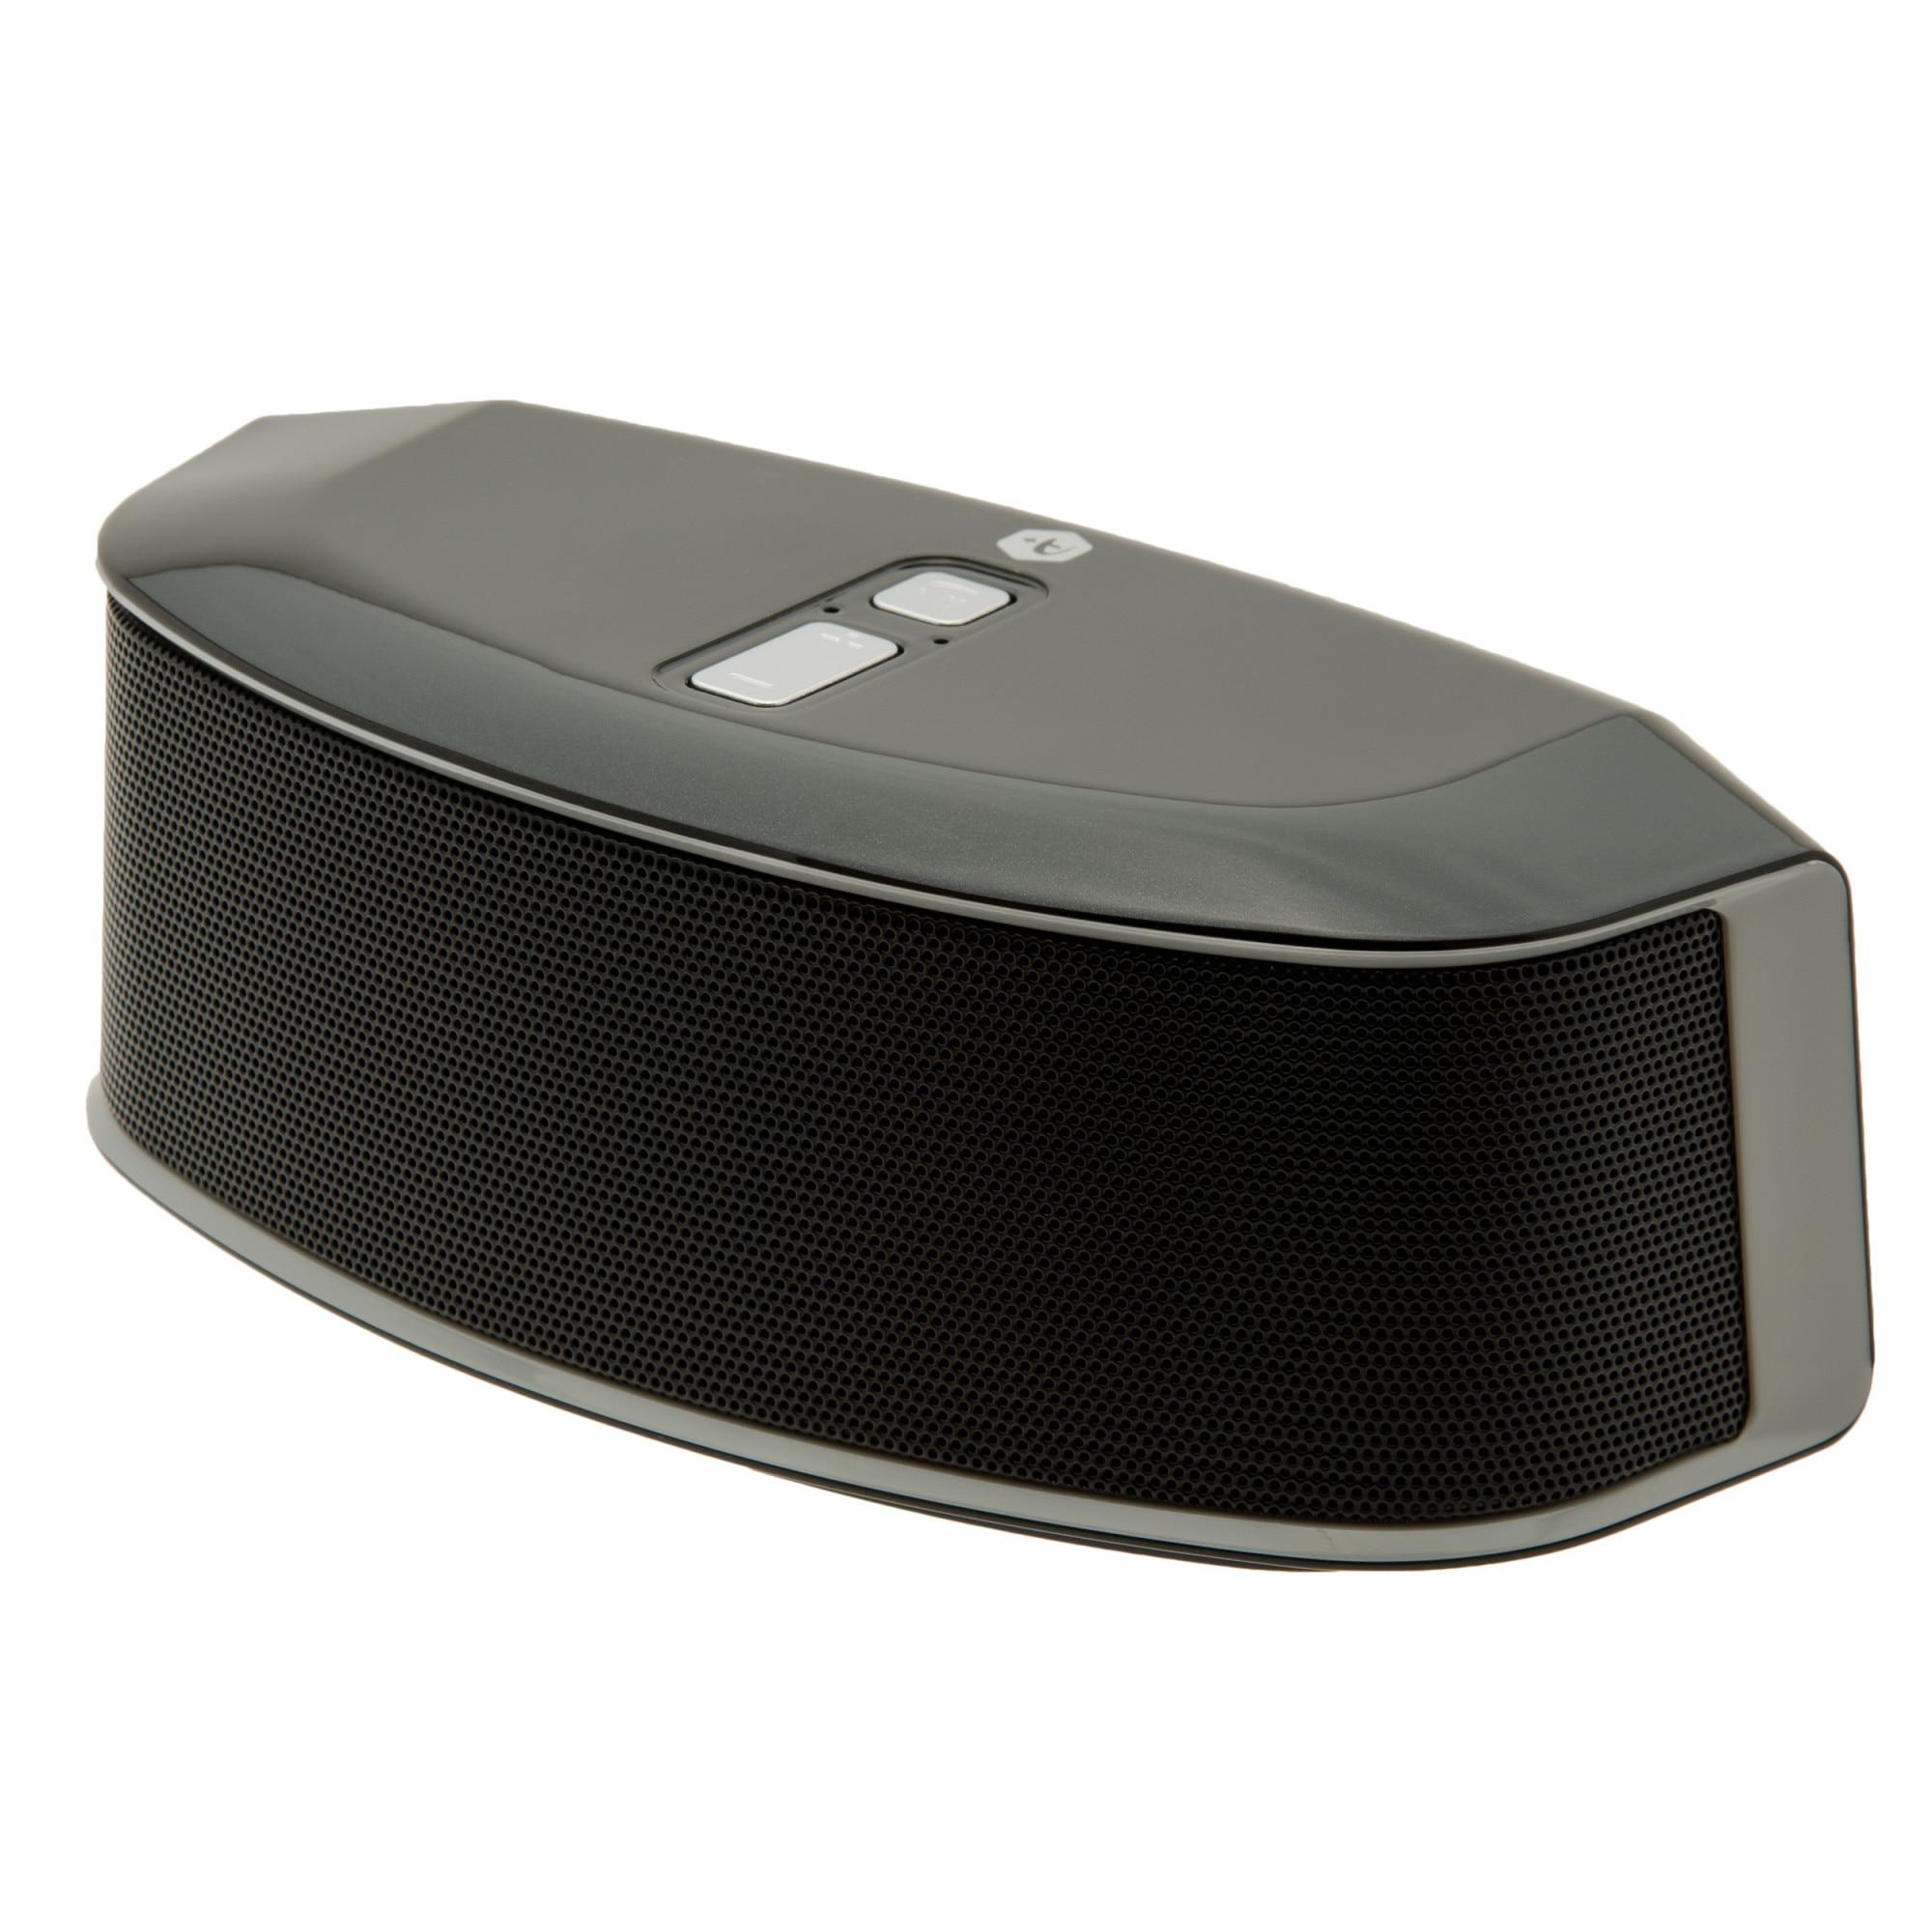 Fotografie Boxa portabila bluetooth A+ Soul, 12W, port USB/micro SD, Negru